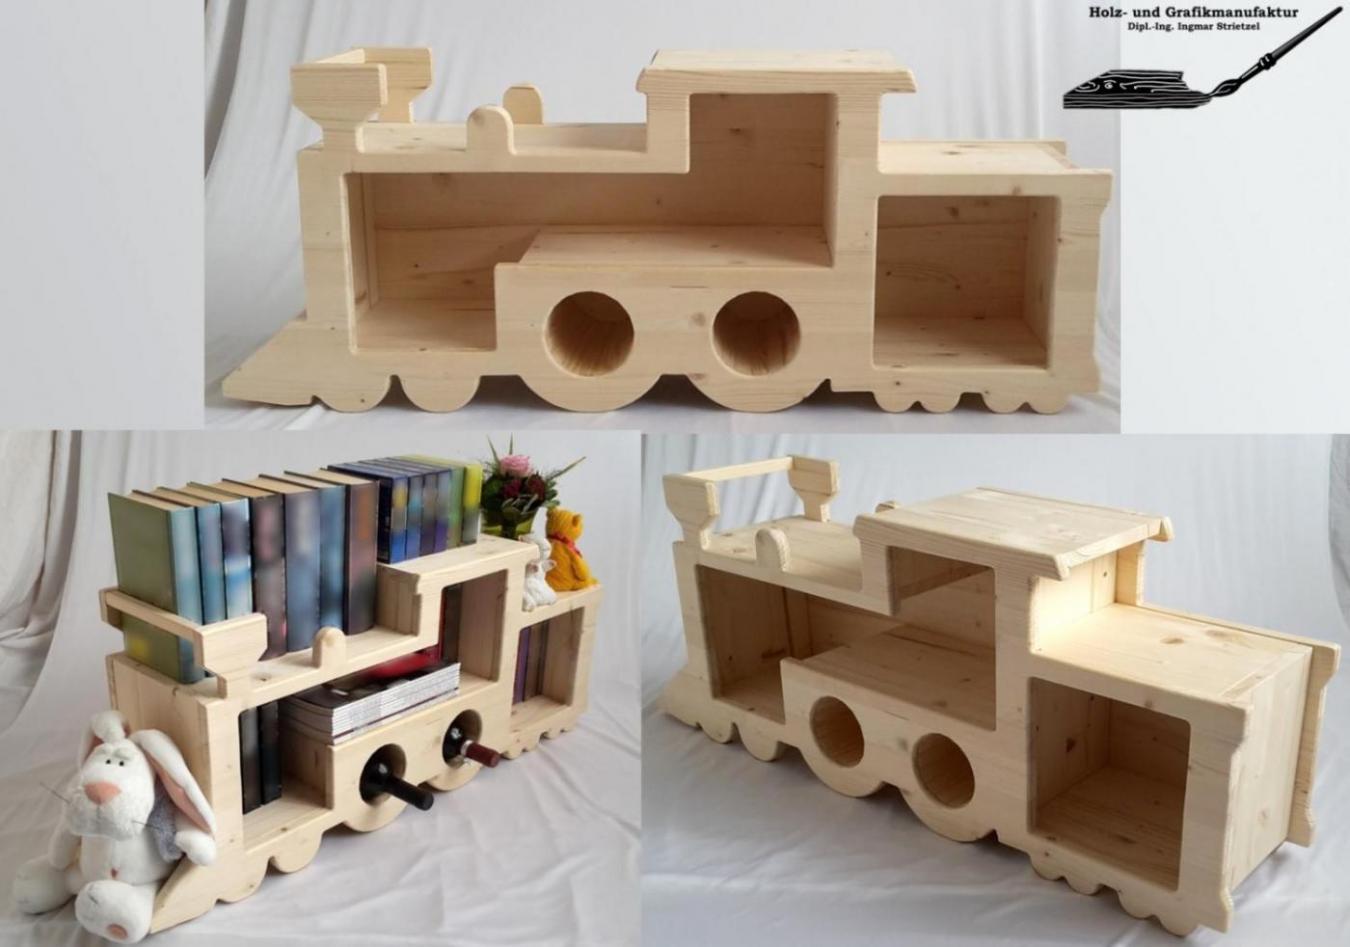 Holz- und Grafikmanufaktur 2